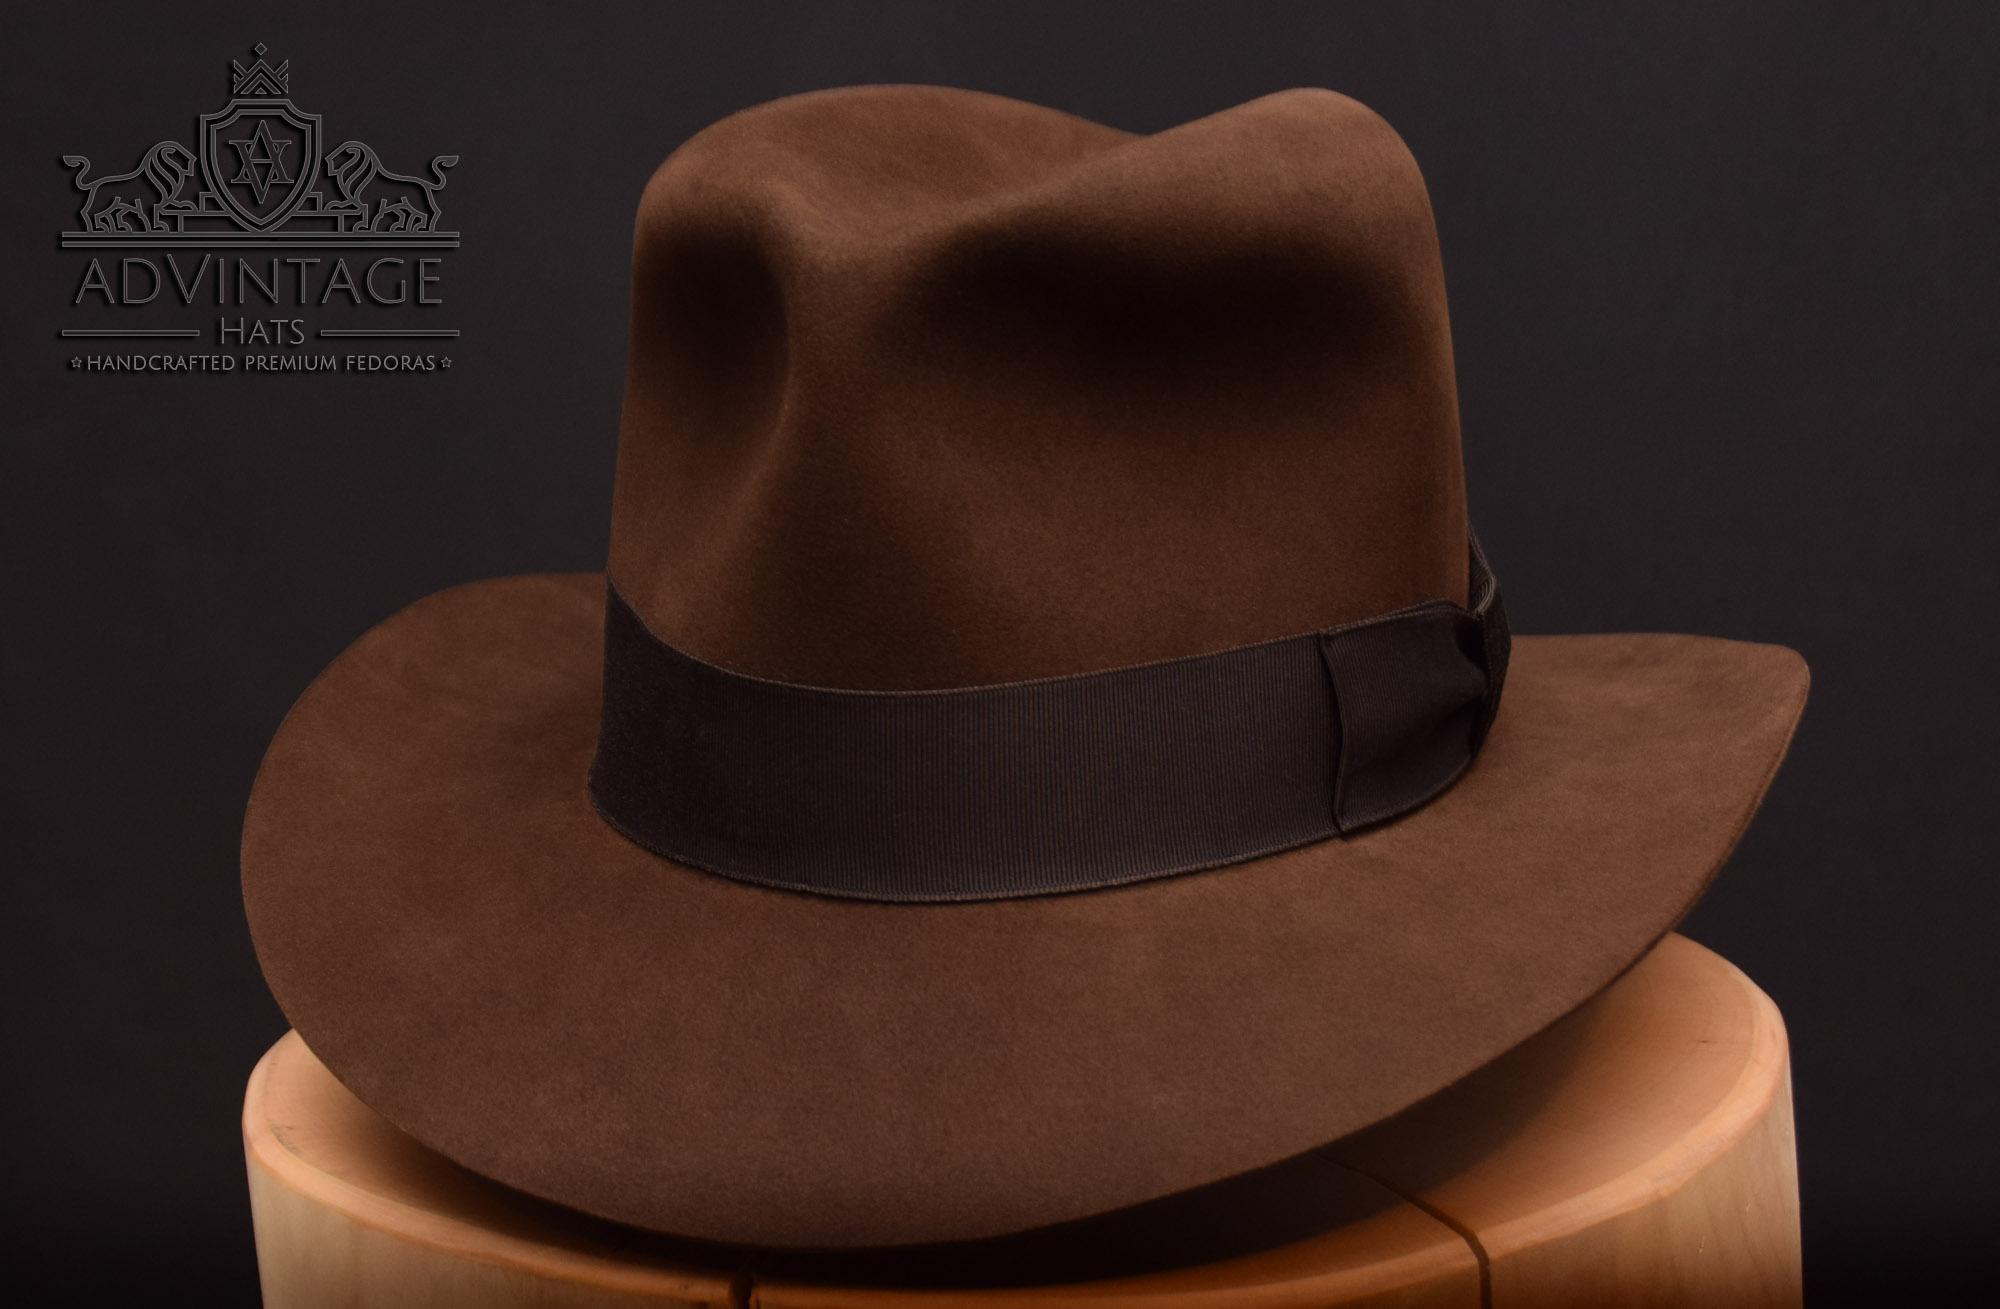 advintage hats masterpiece fedora indy indiana jones last crusade hut 1